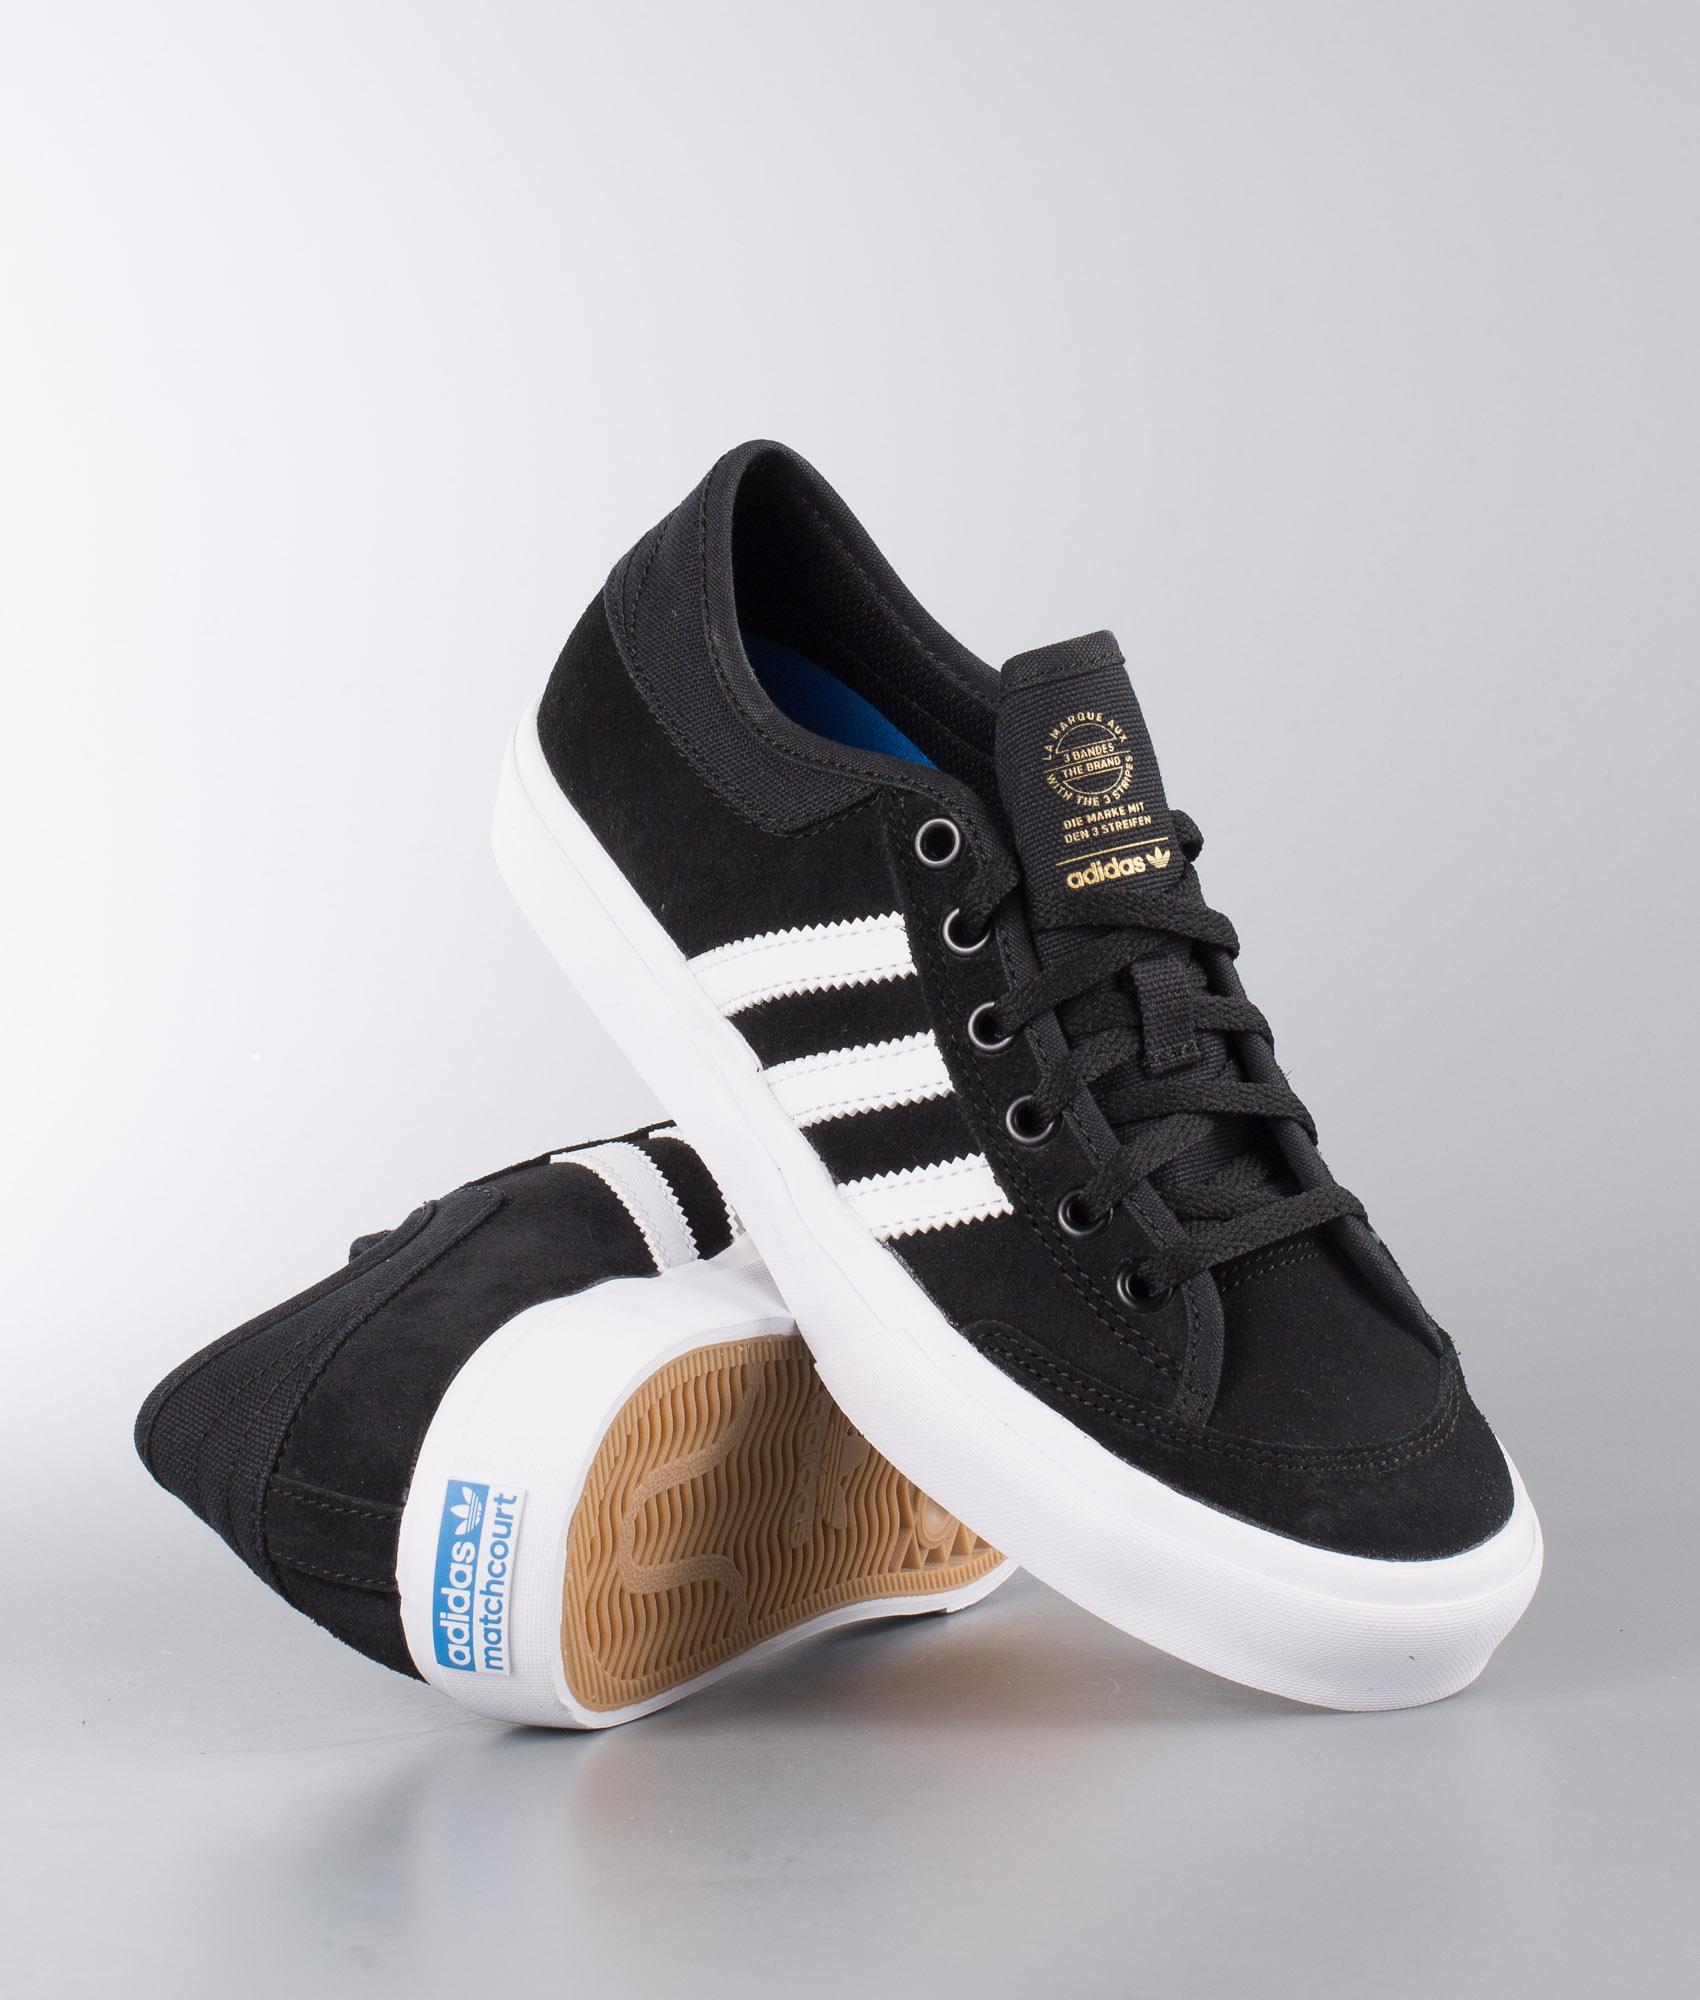 Adidas Kaufe Hier Online Schuhe Skateboarding Tpzwgq1